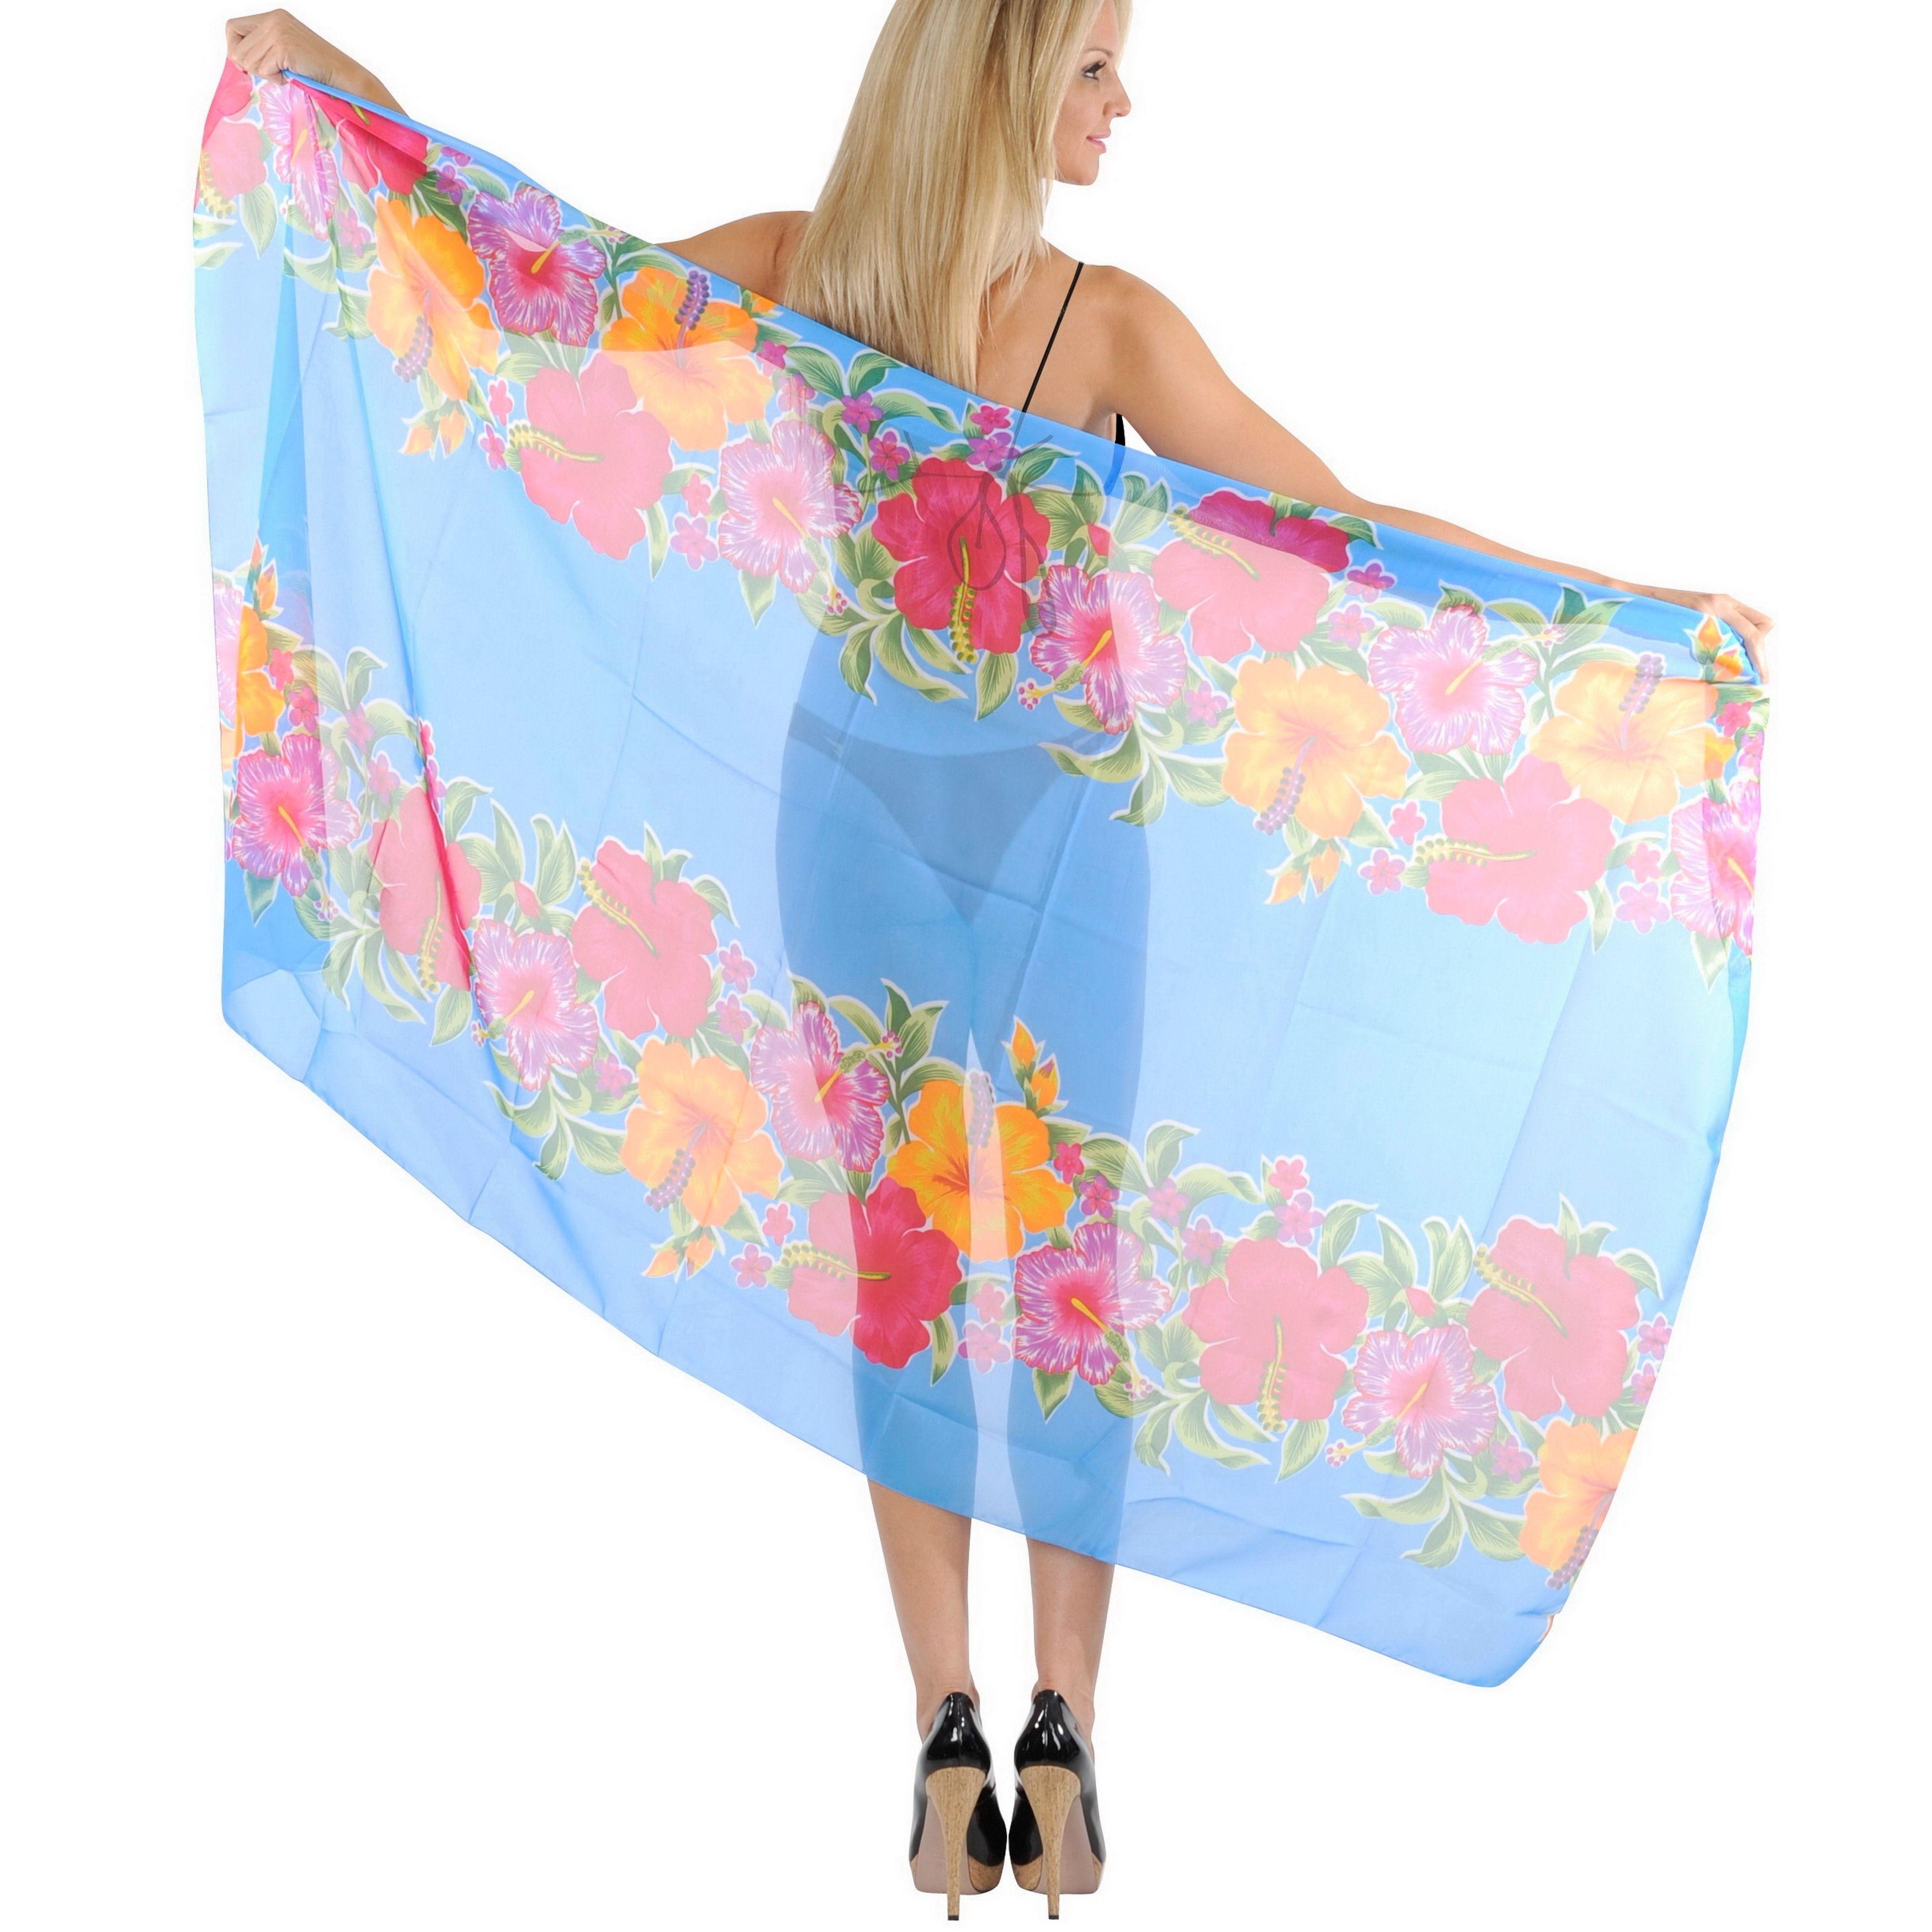 La Leela Cover up Sarong Beachwear 3 in 1 Hawaiian Pareo Shawl Scarf Pretty Women Women's